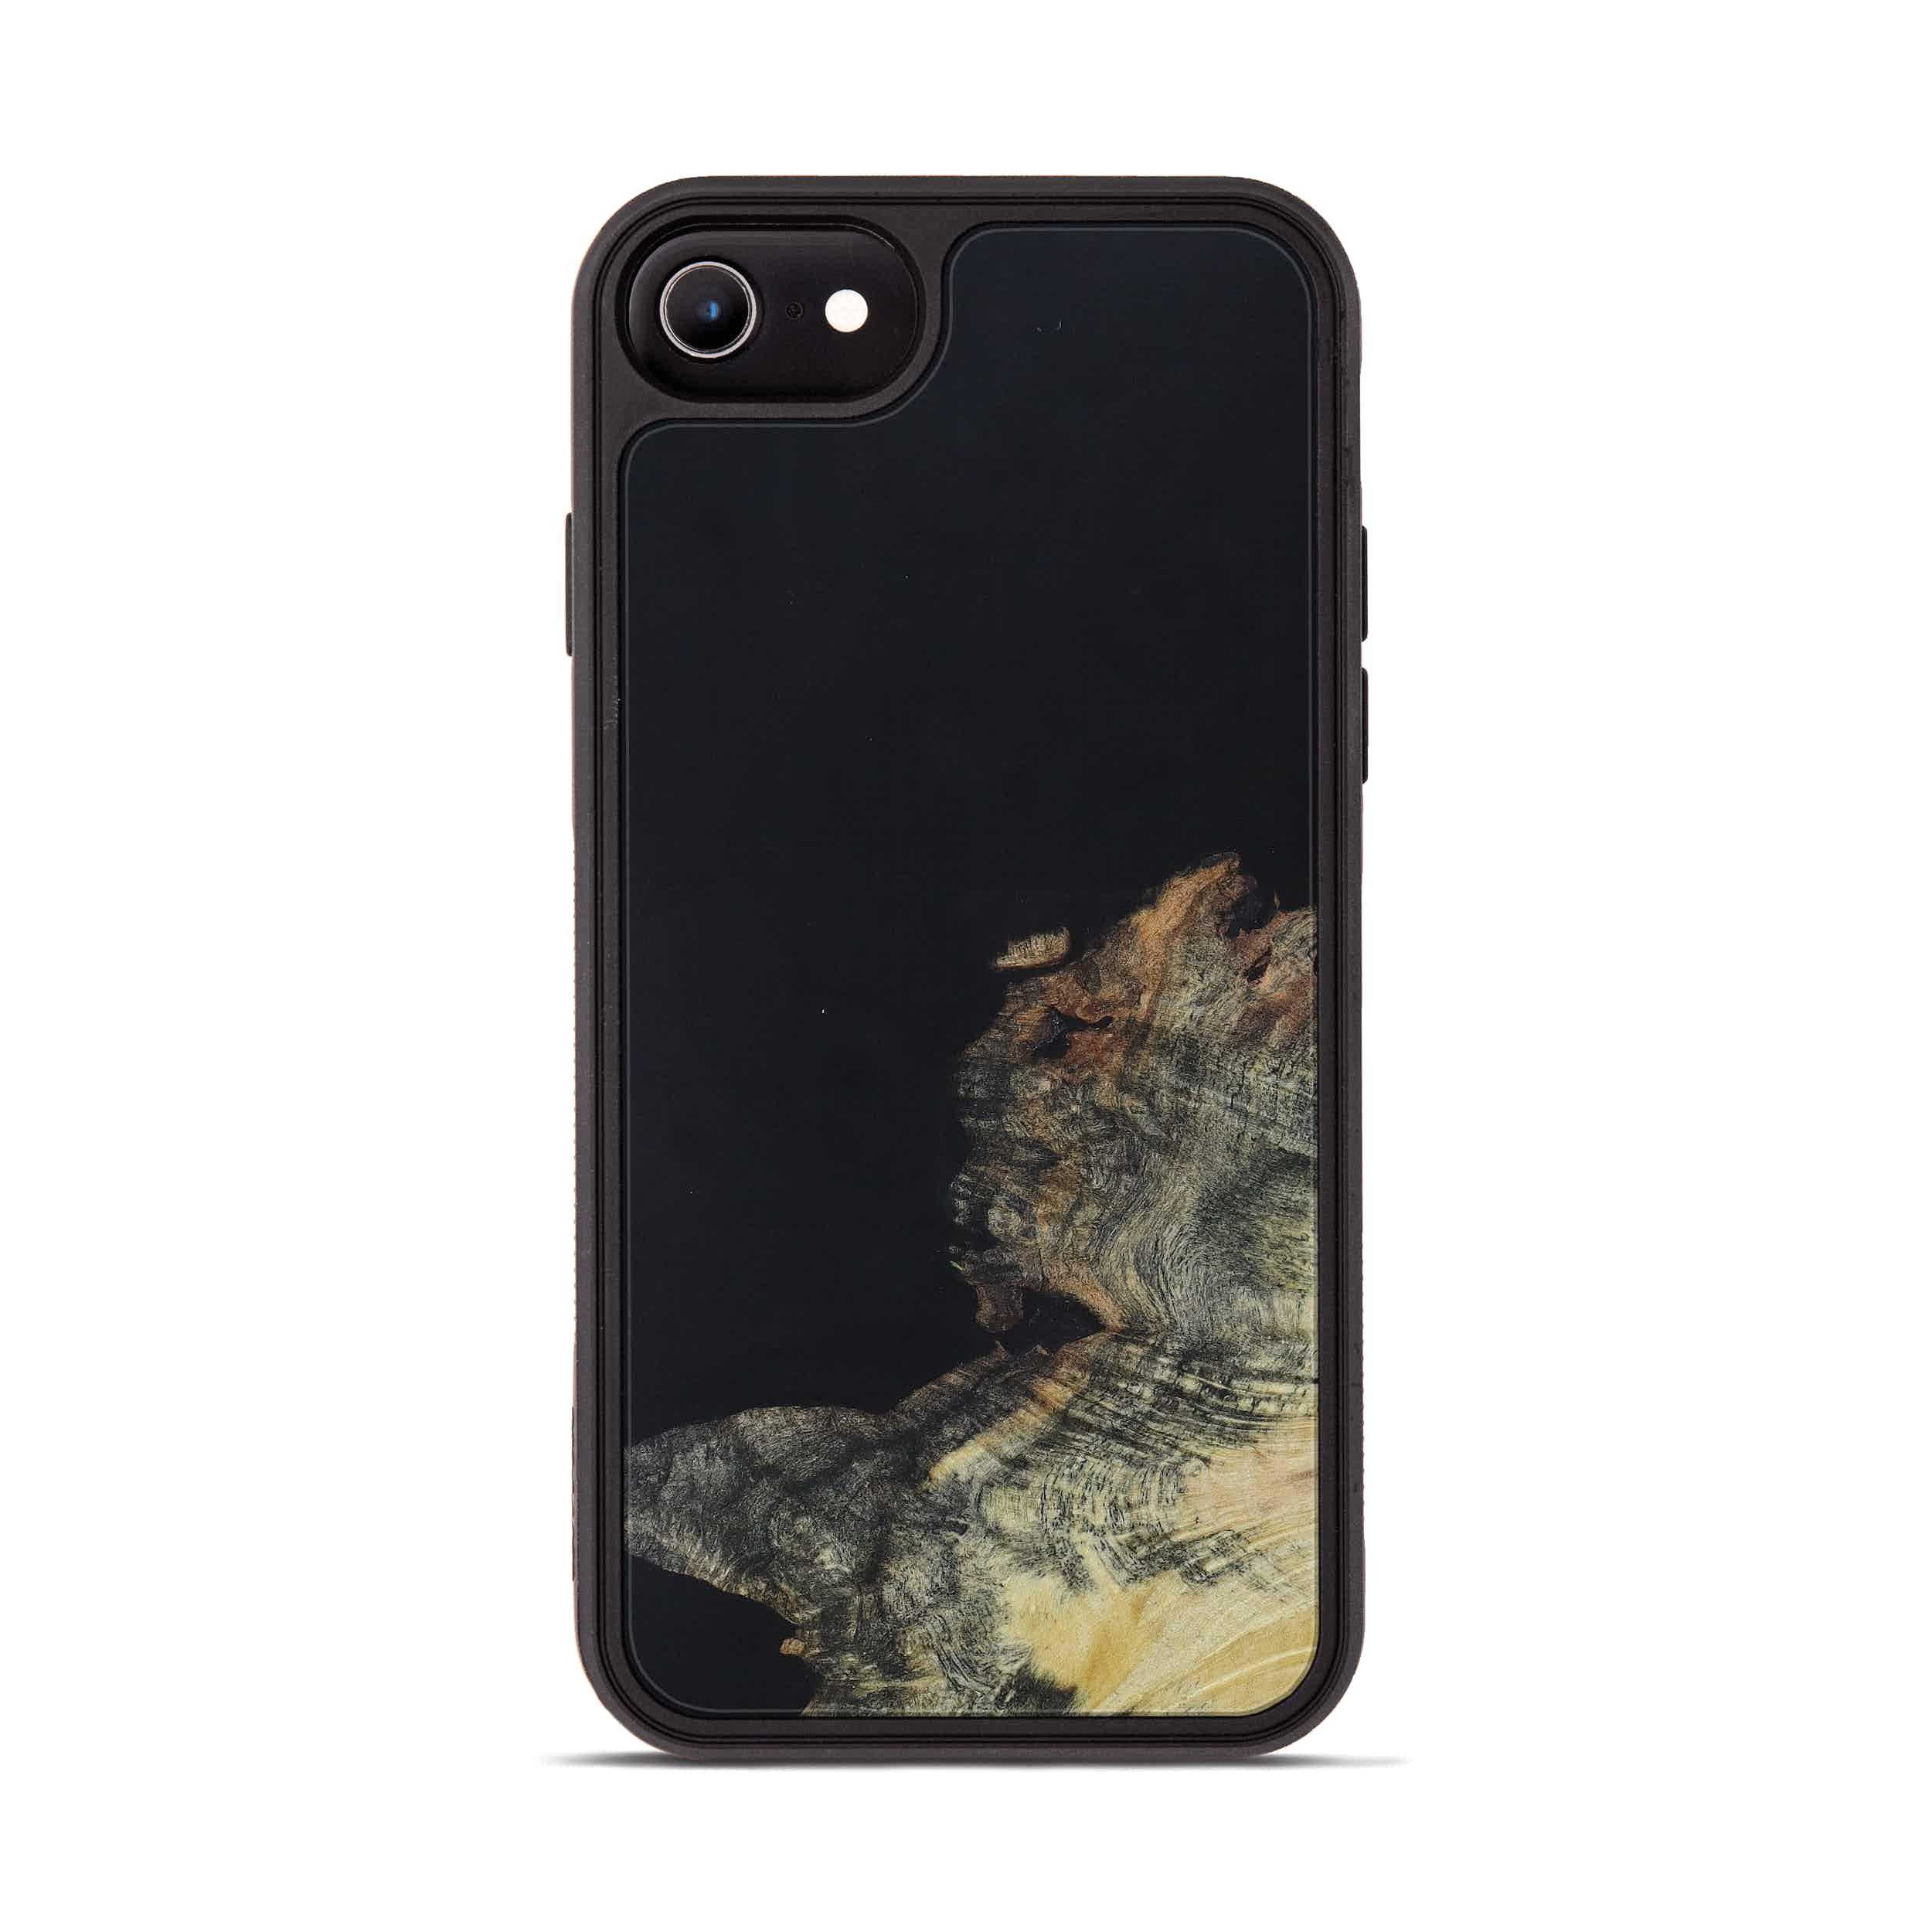 iPhone 6s Wood+Resin Phone Case - Arne (Pure Black, 395150)